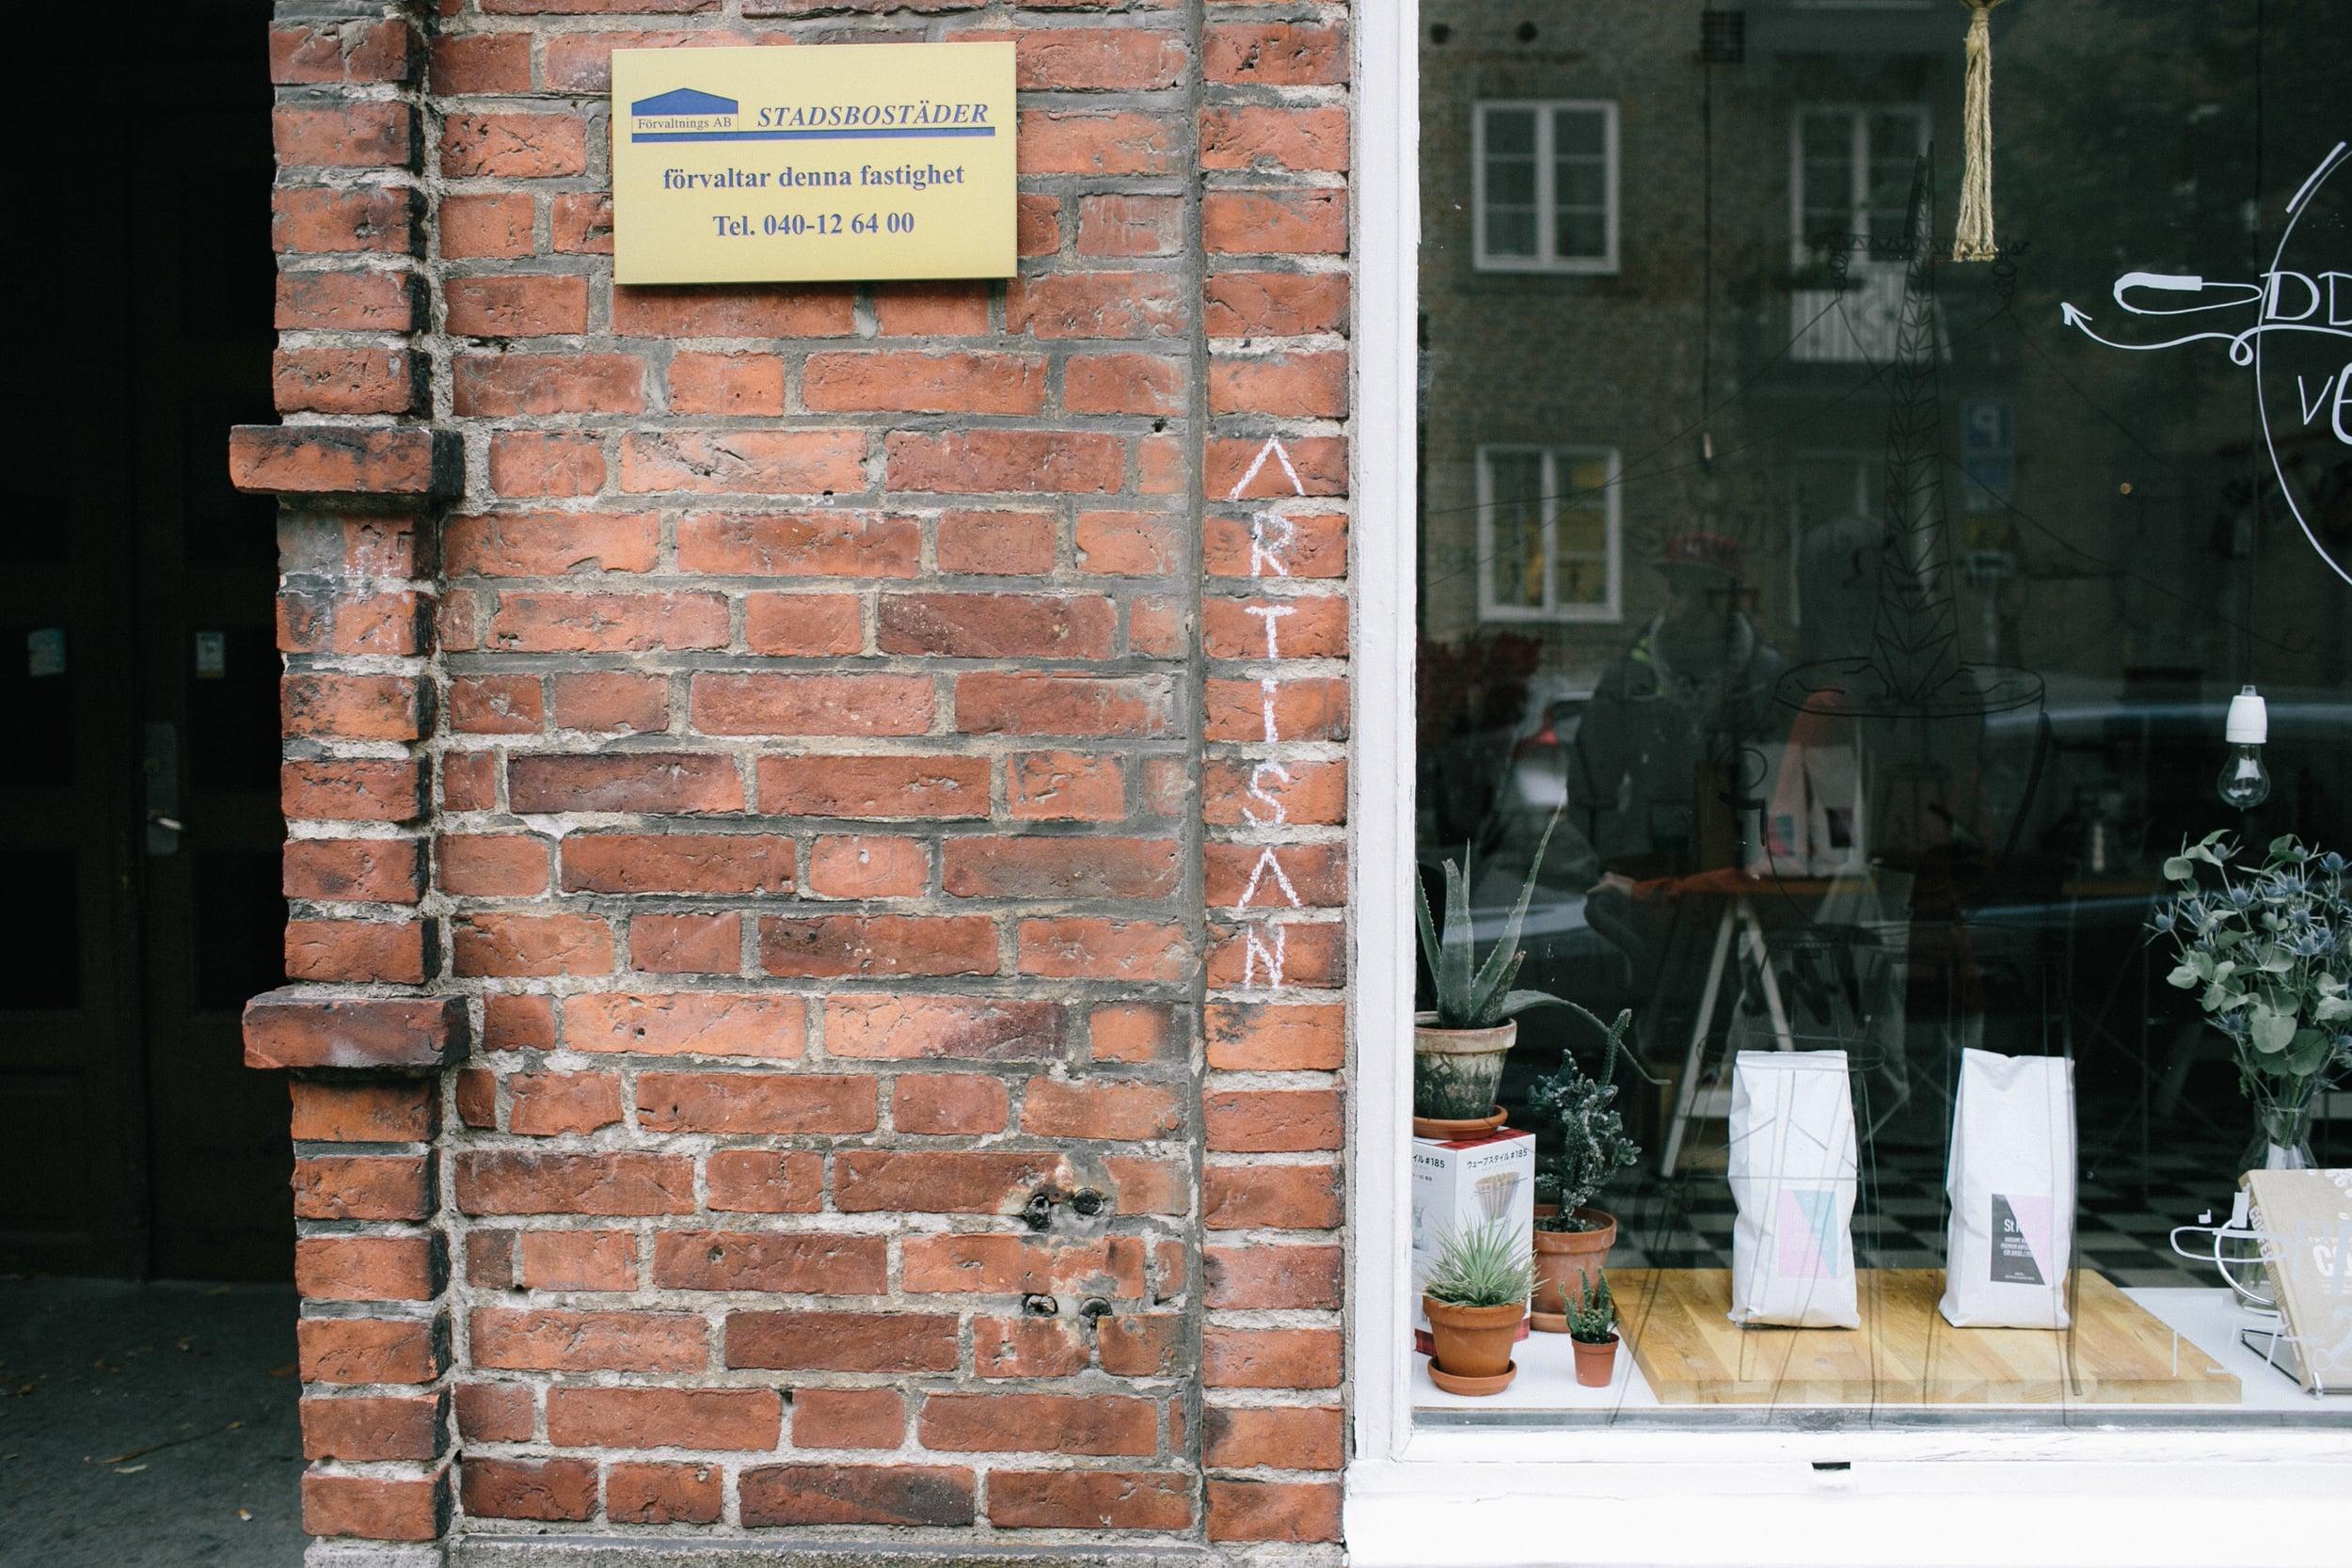 Artisan_Coffee_Store_St_Knuts-1.JPG